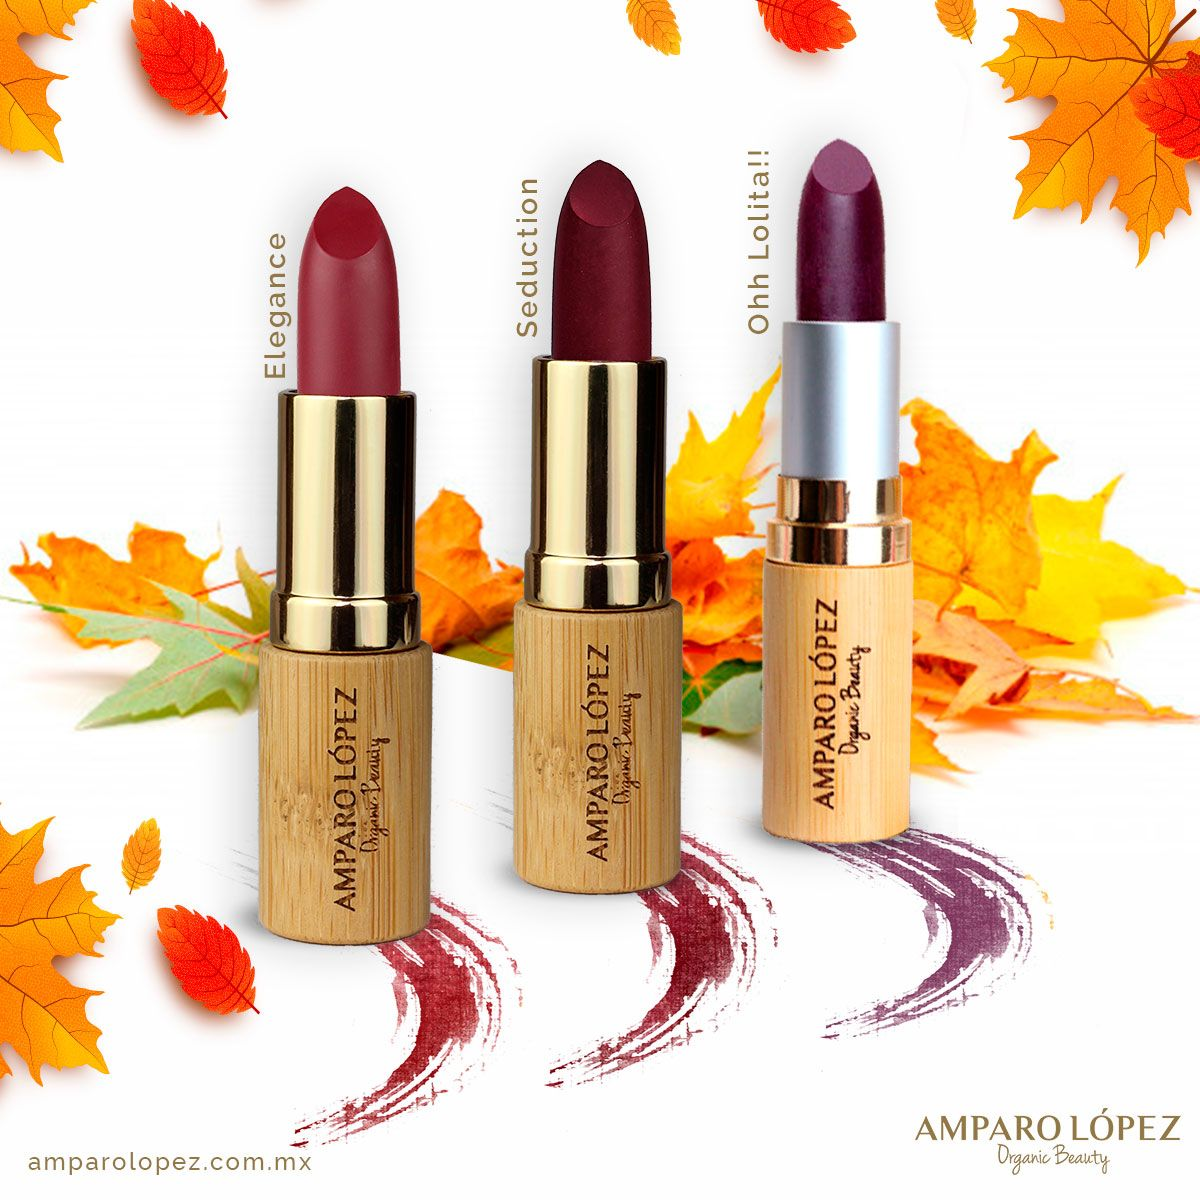 Amparo López Organic Beauty